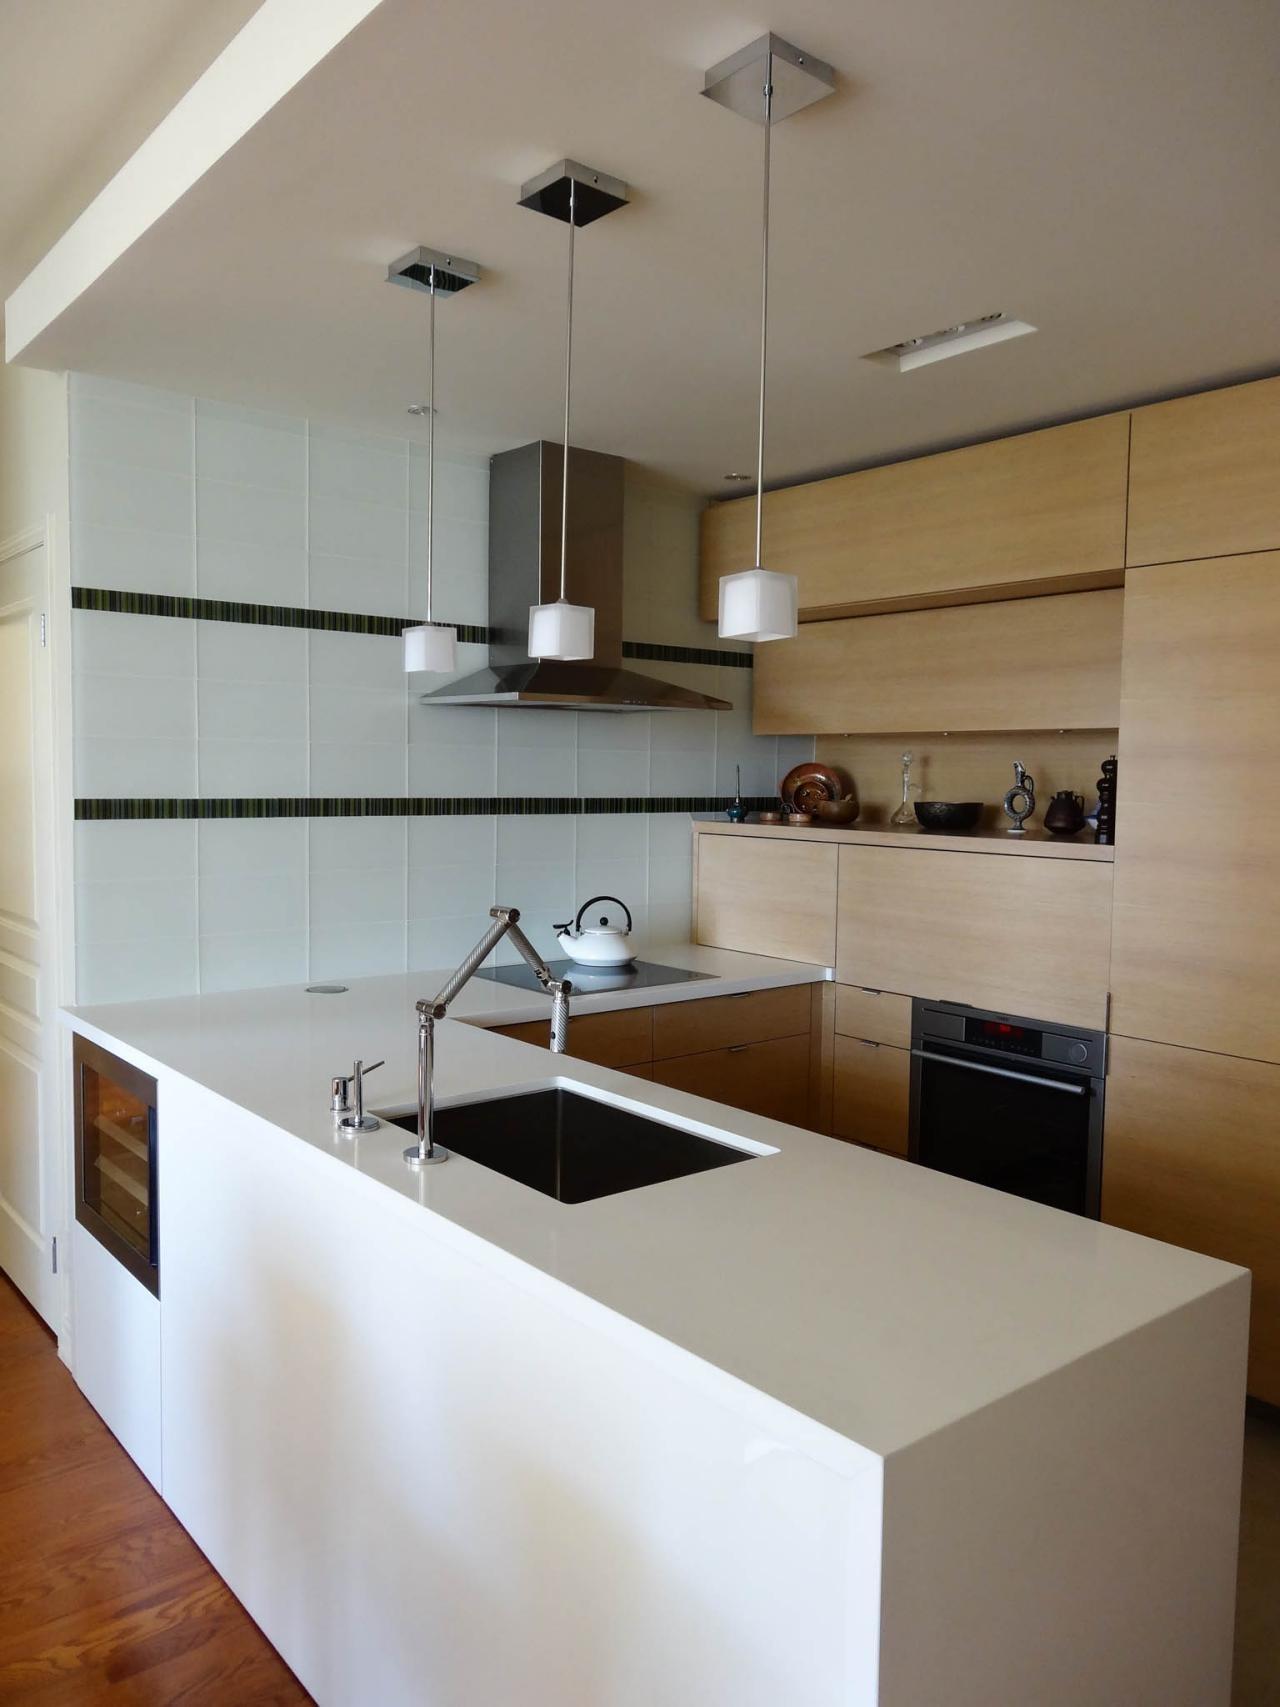 Kitchen Cabinets Design thewowdecor (24)